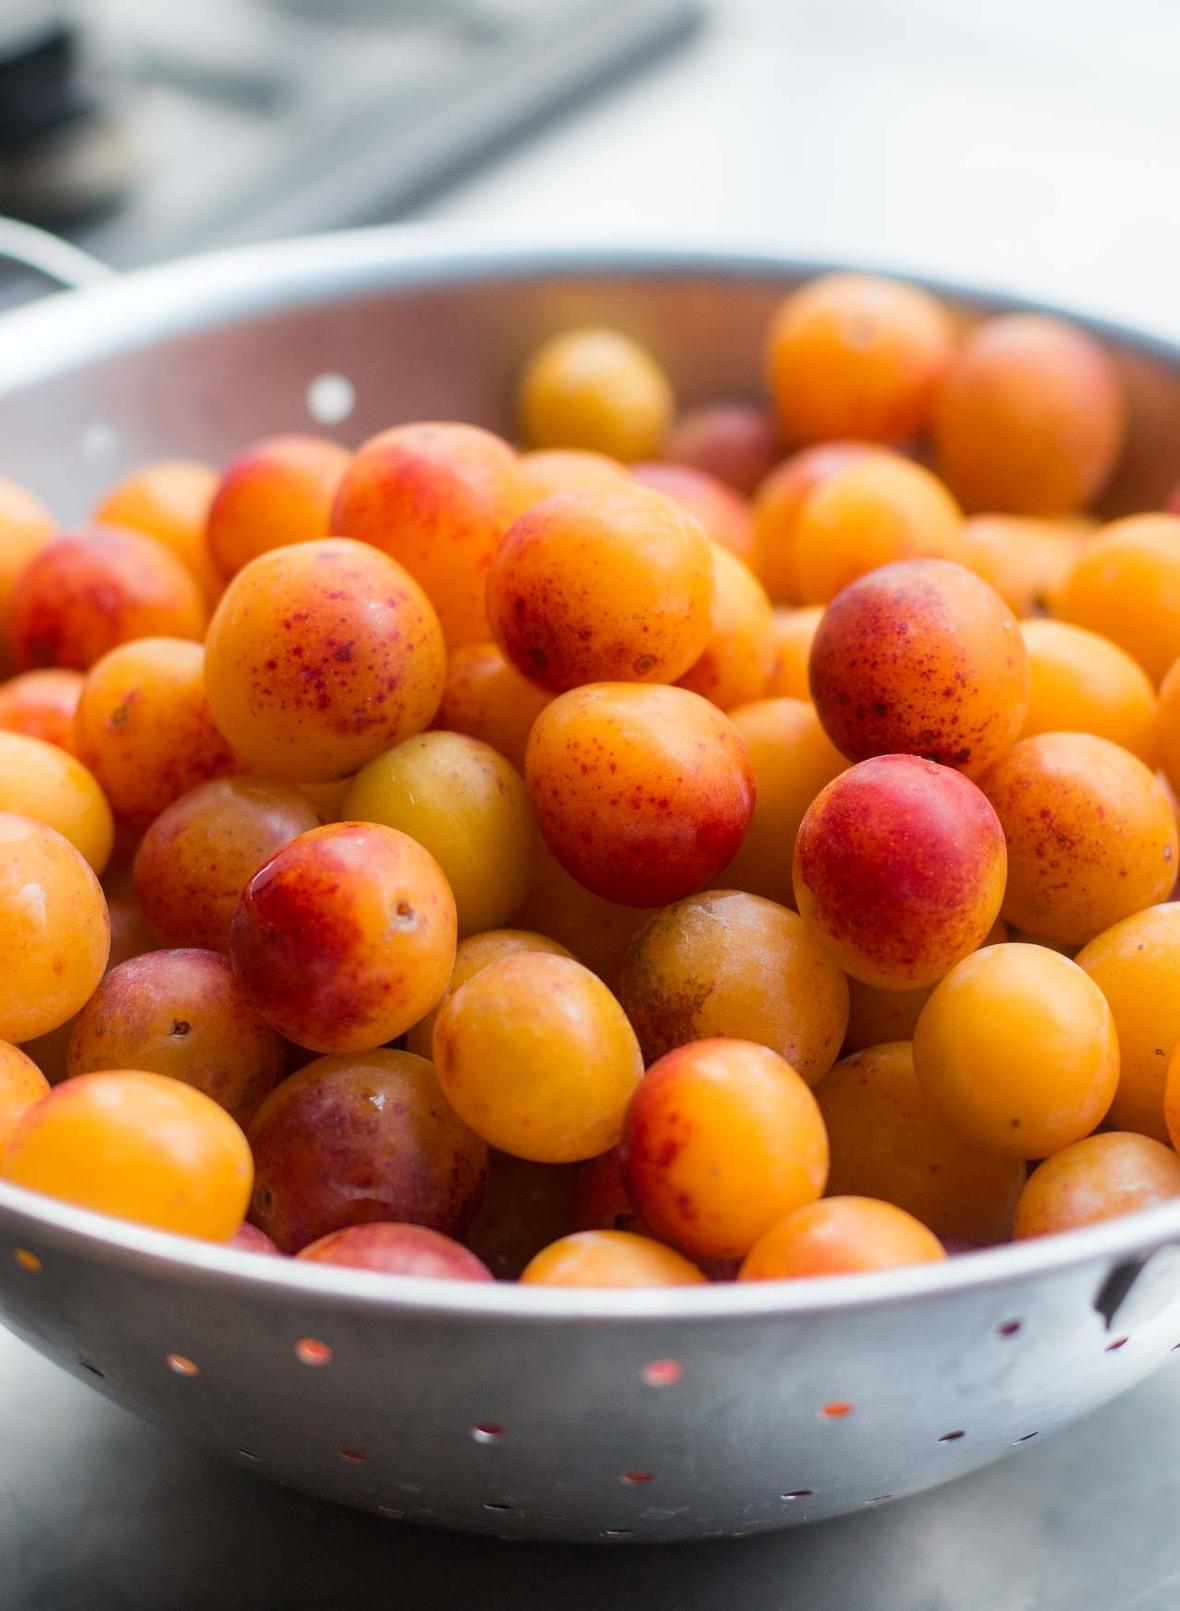 plums for sept newsletter-2